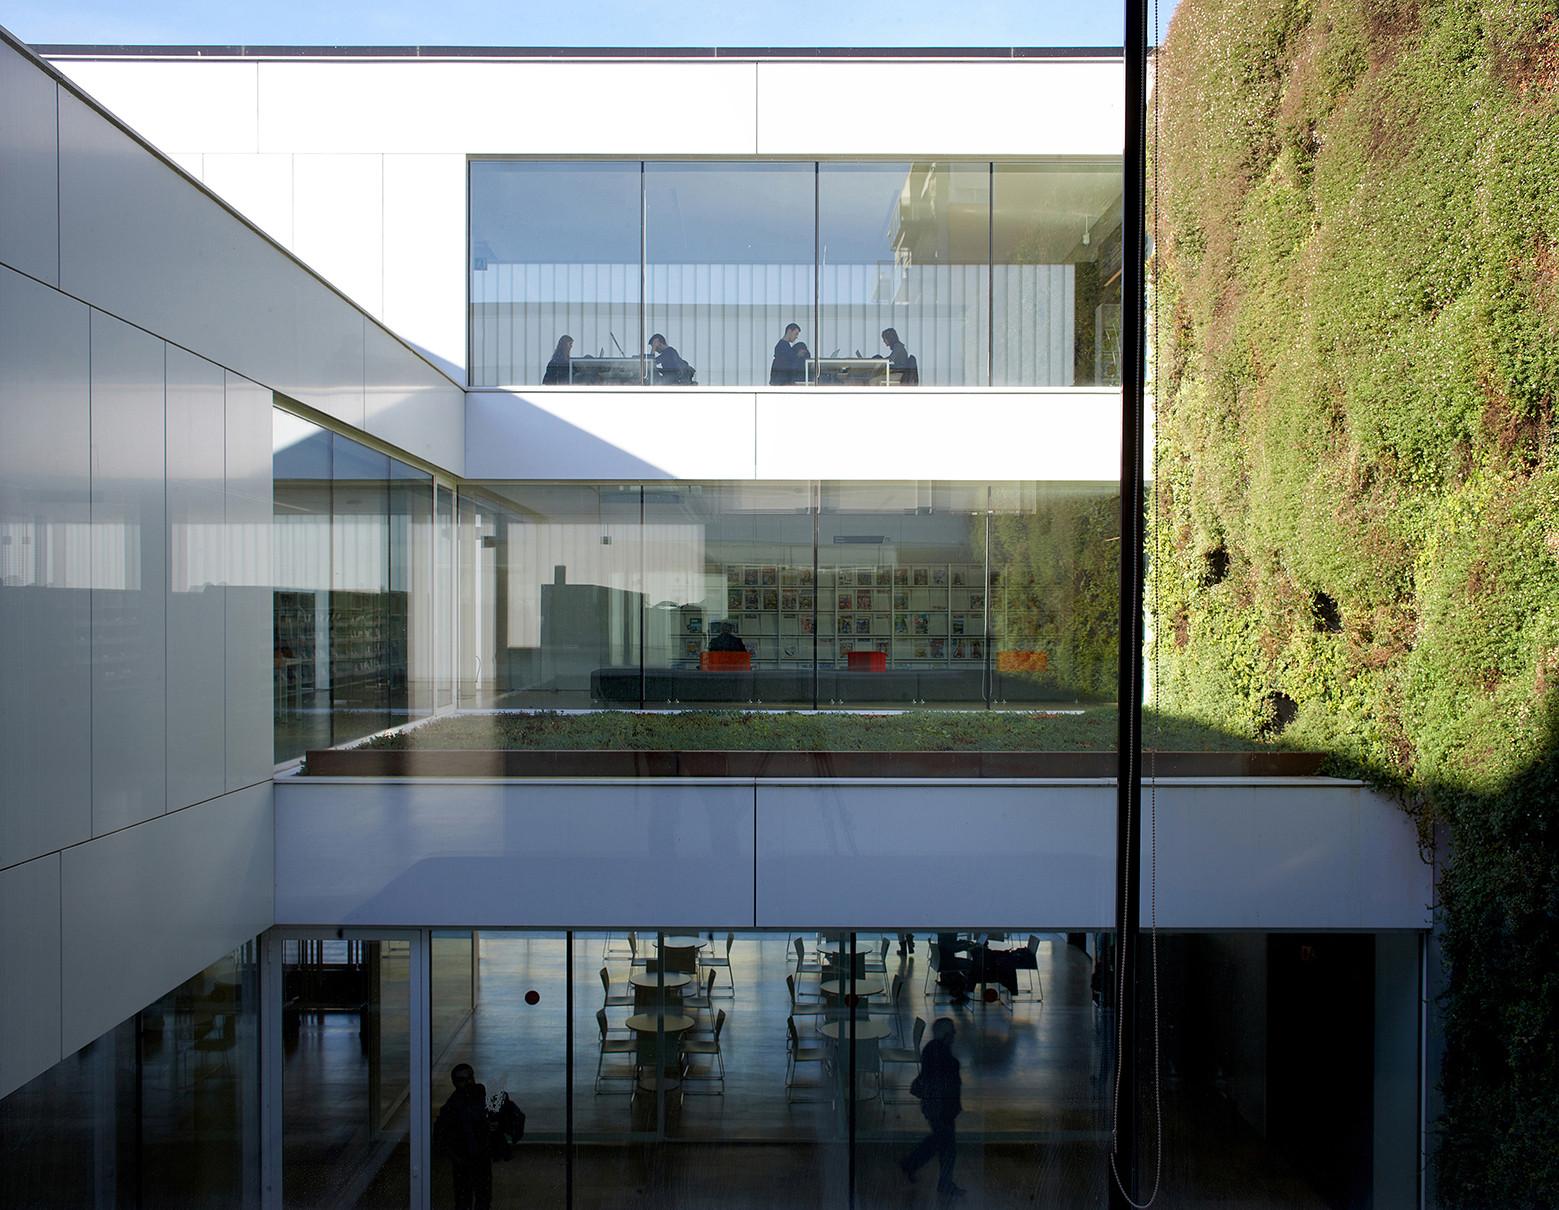 Gallery of girona public library corea moran arquitectura 17 - Arquitectura girona ...